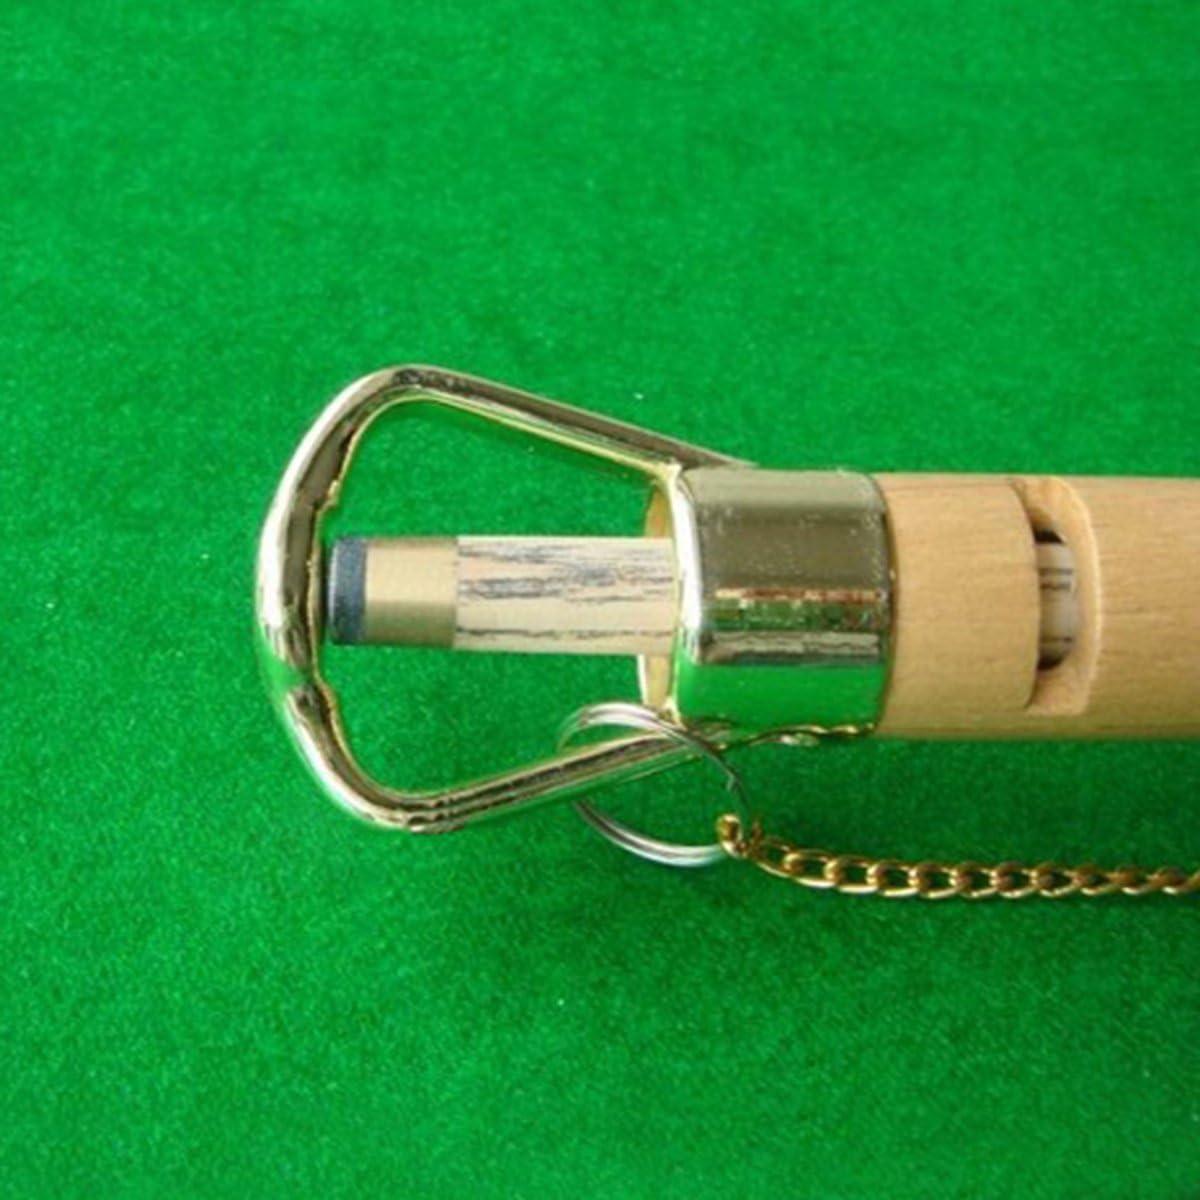 JVSISM Holz Tip Clamp Billard Pool Snooker Queue Reparatur Rod Helfer Holz Queue Spitze Clamp Repair Tool